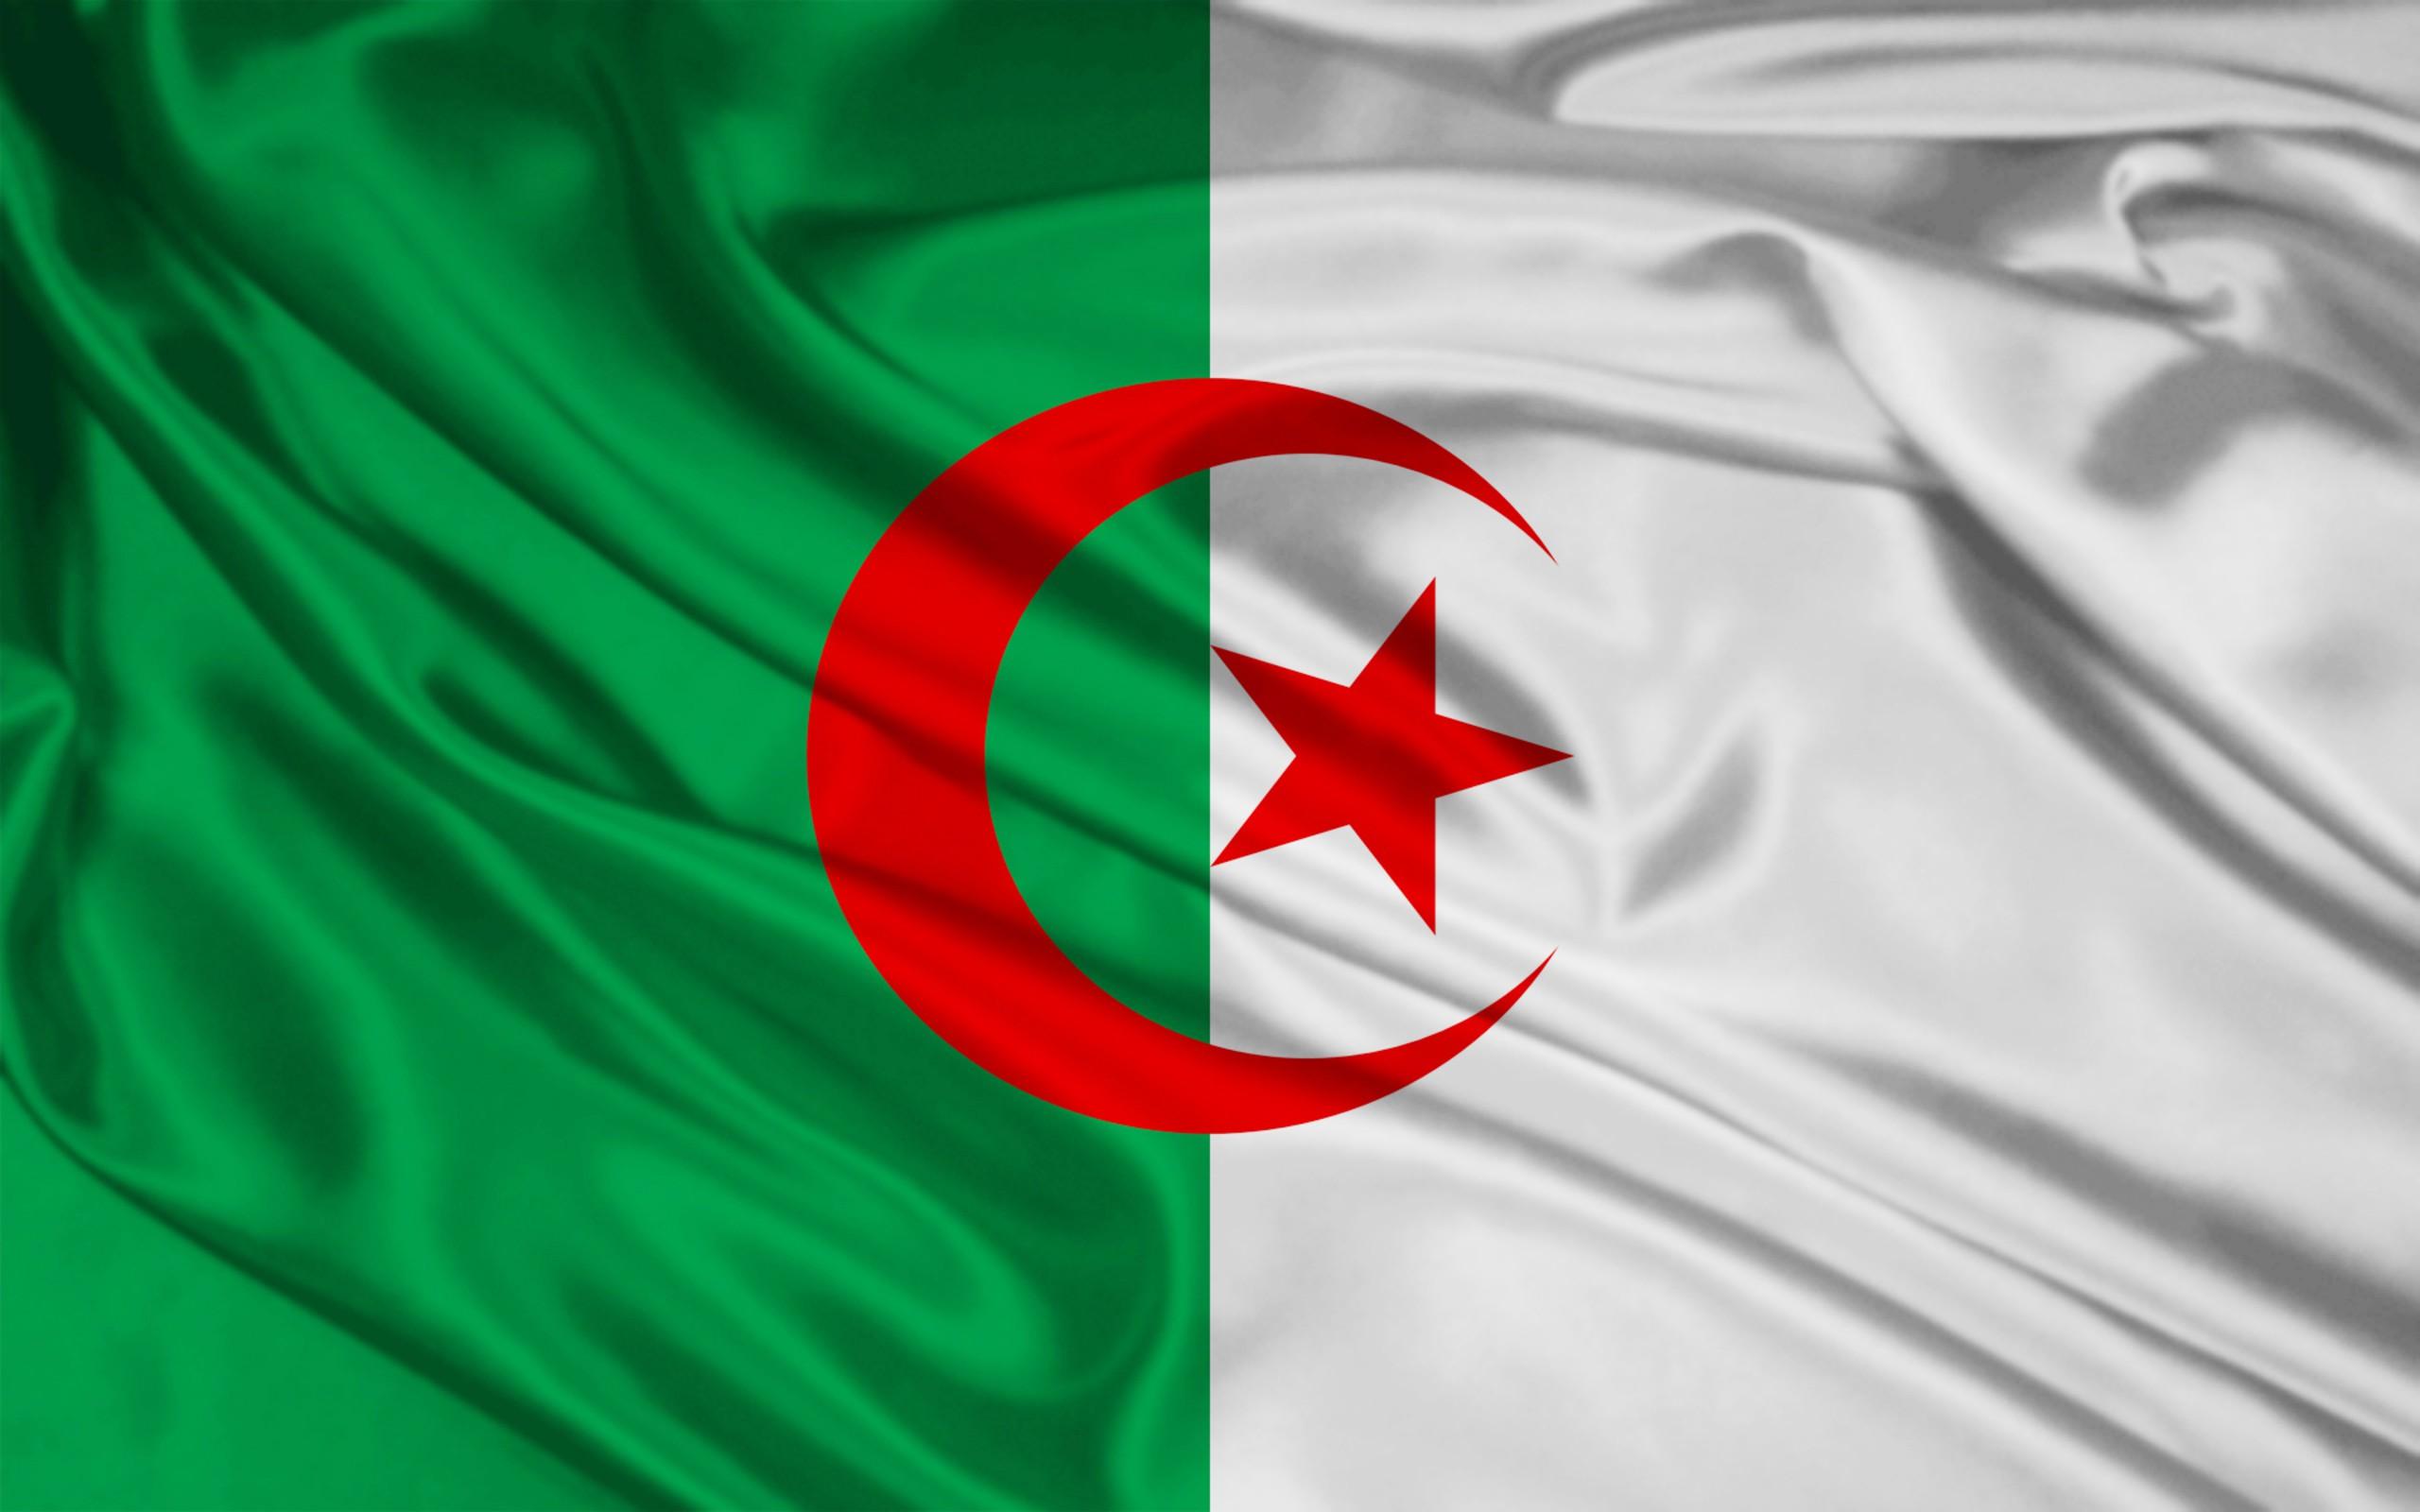 Top HD Algeria Flag Wallpaper Travelling HD 30138 KB 2560x1600